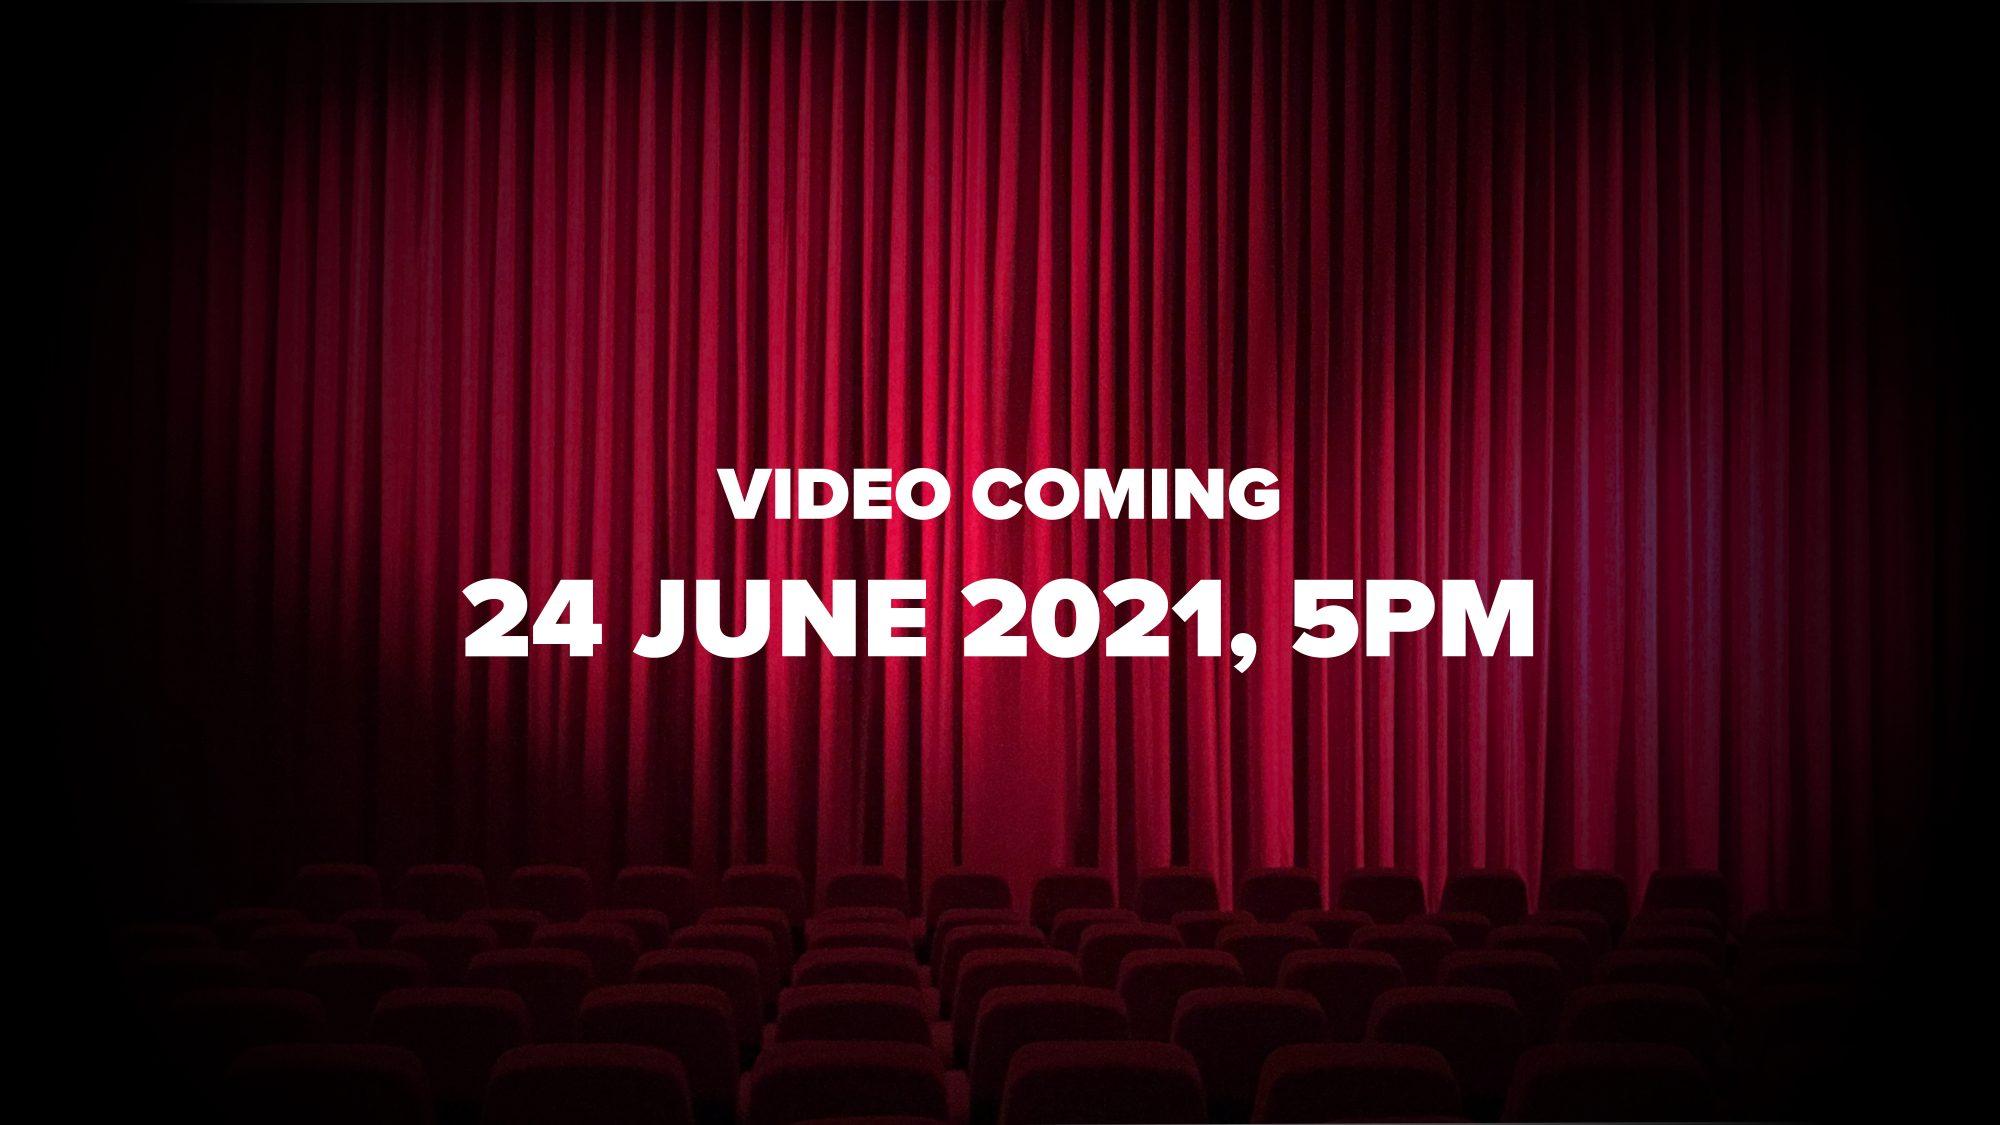 Video Coming 24 June 2021, 5pm